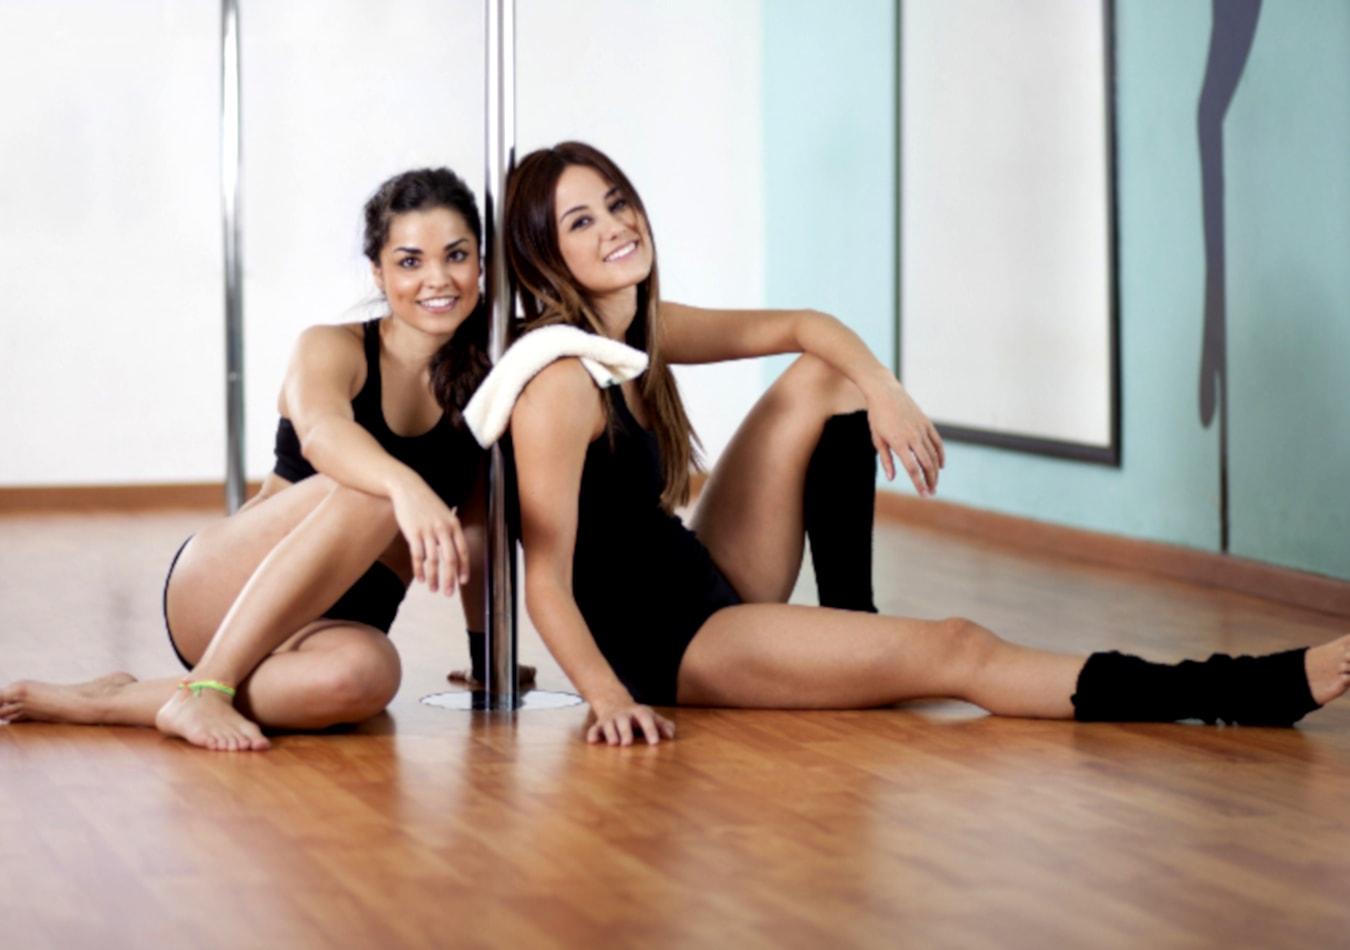 cours de pole dance malte